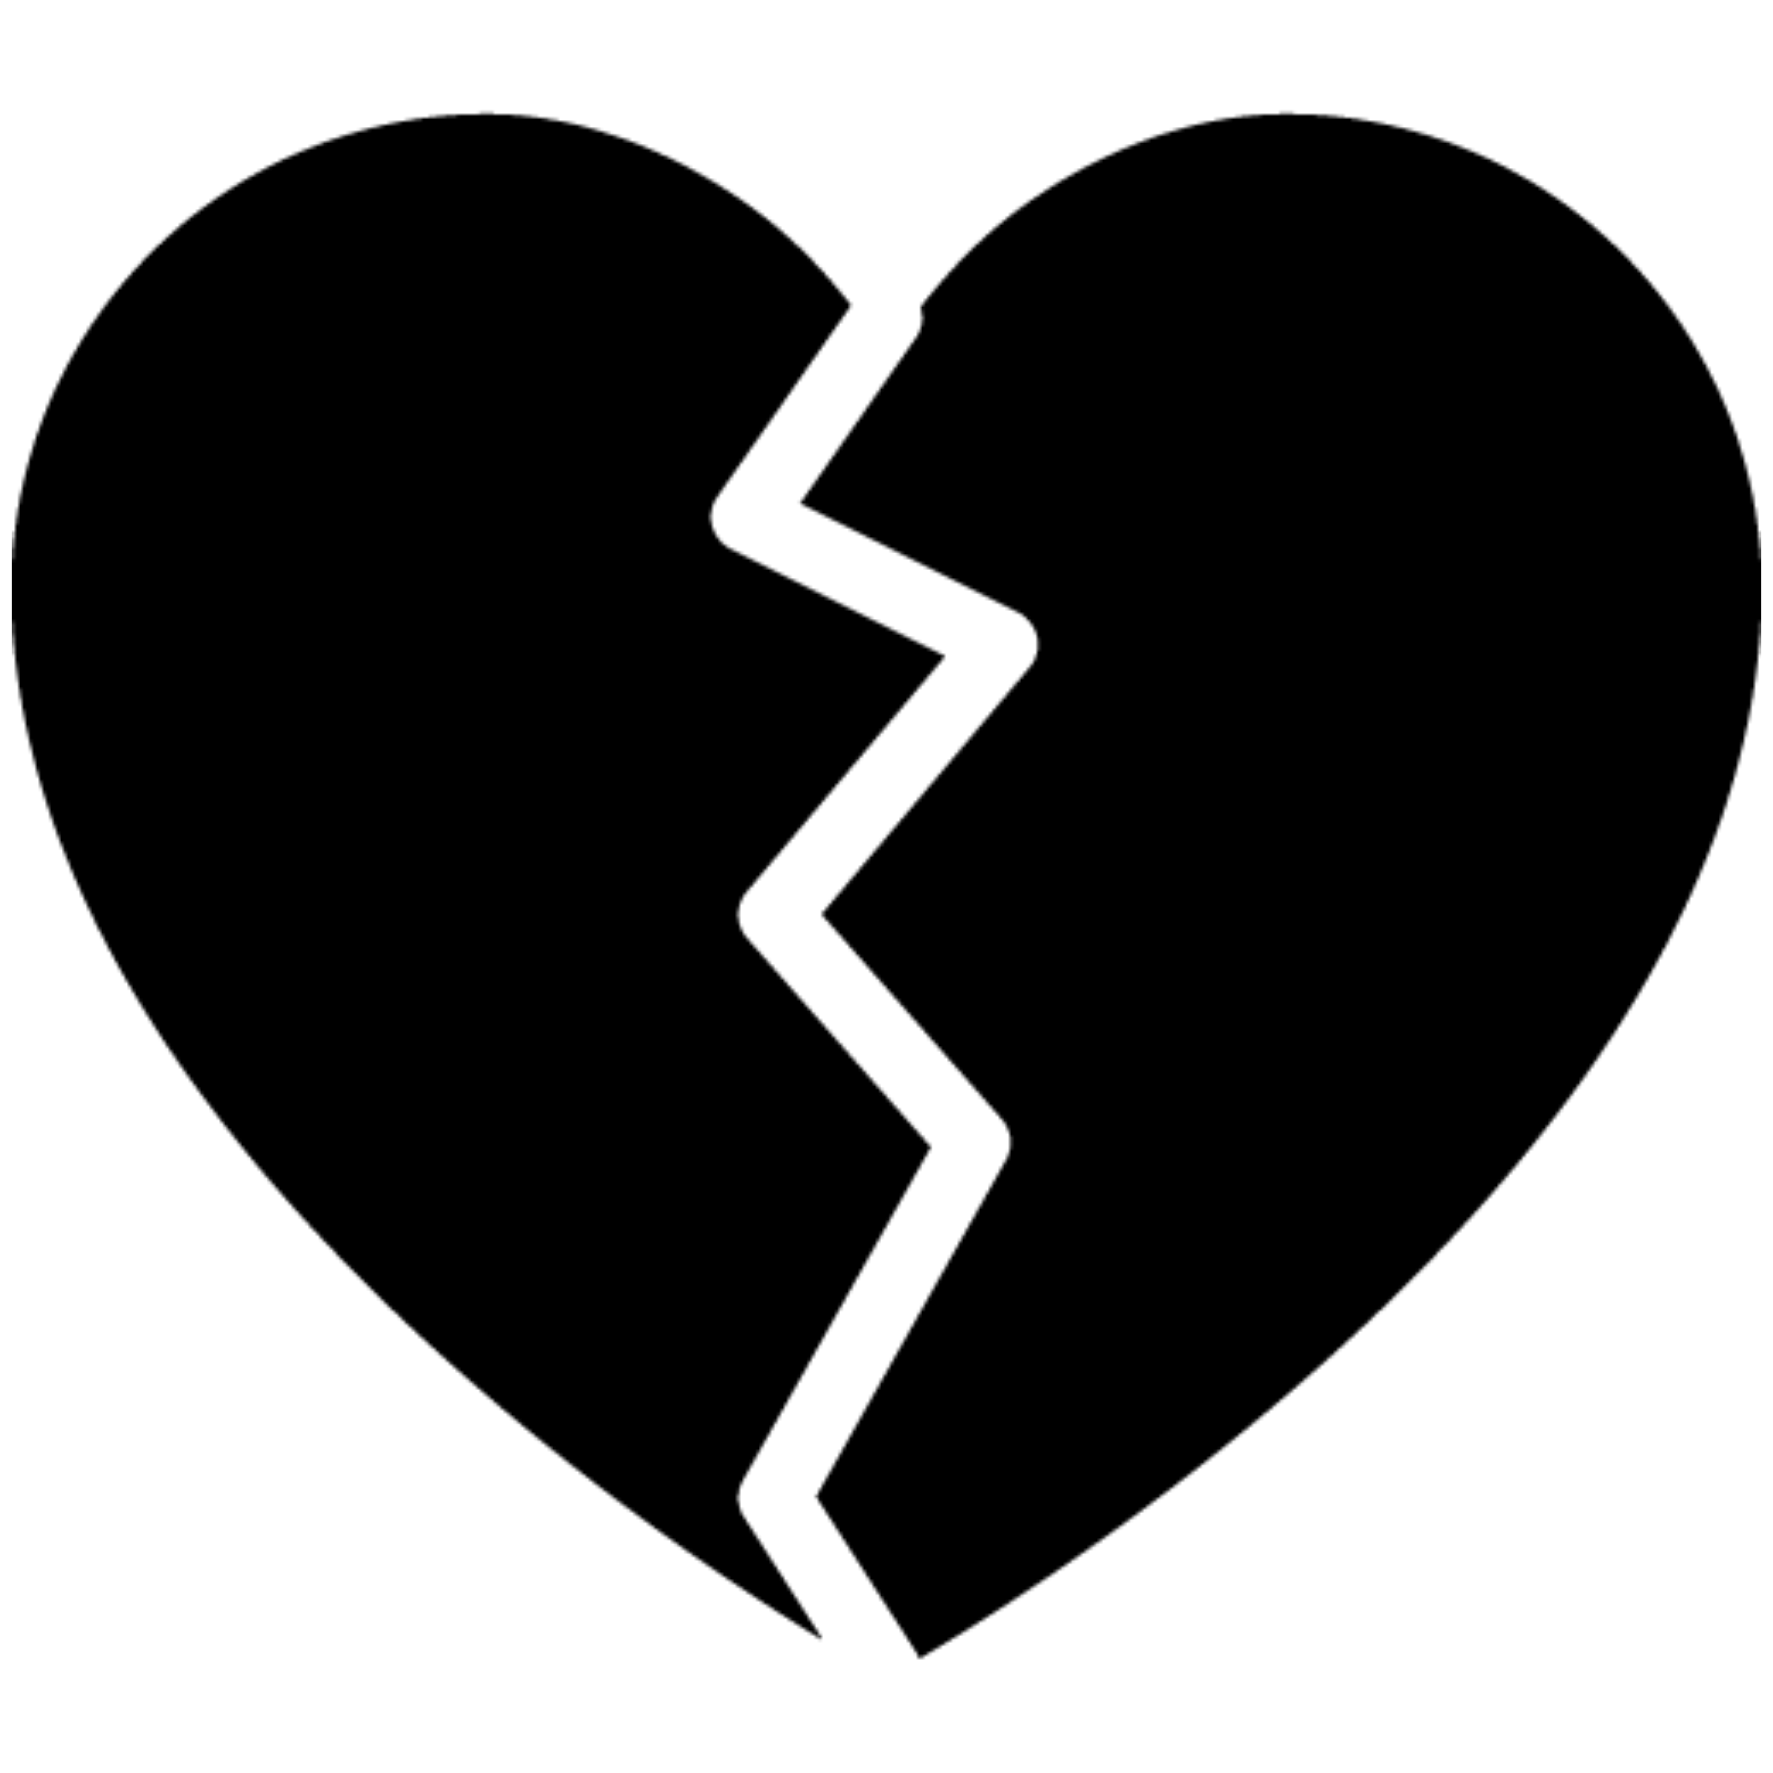 small resolution of  lil peep tatoo broken heart black